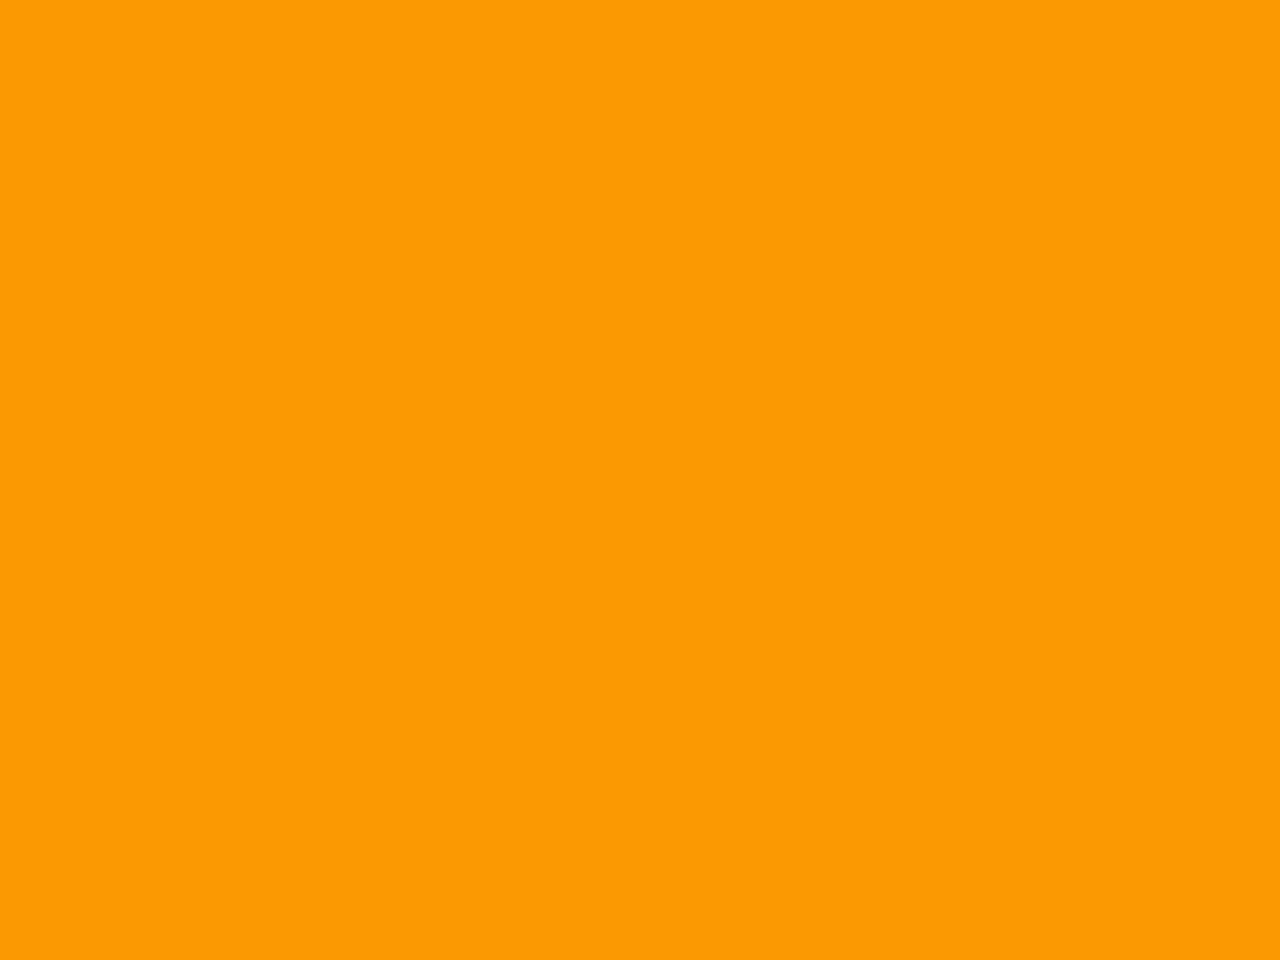 1280x960 Orange RYB Solid Color Background